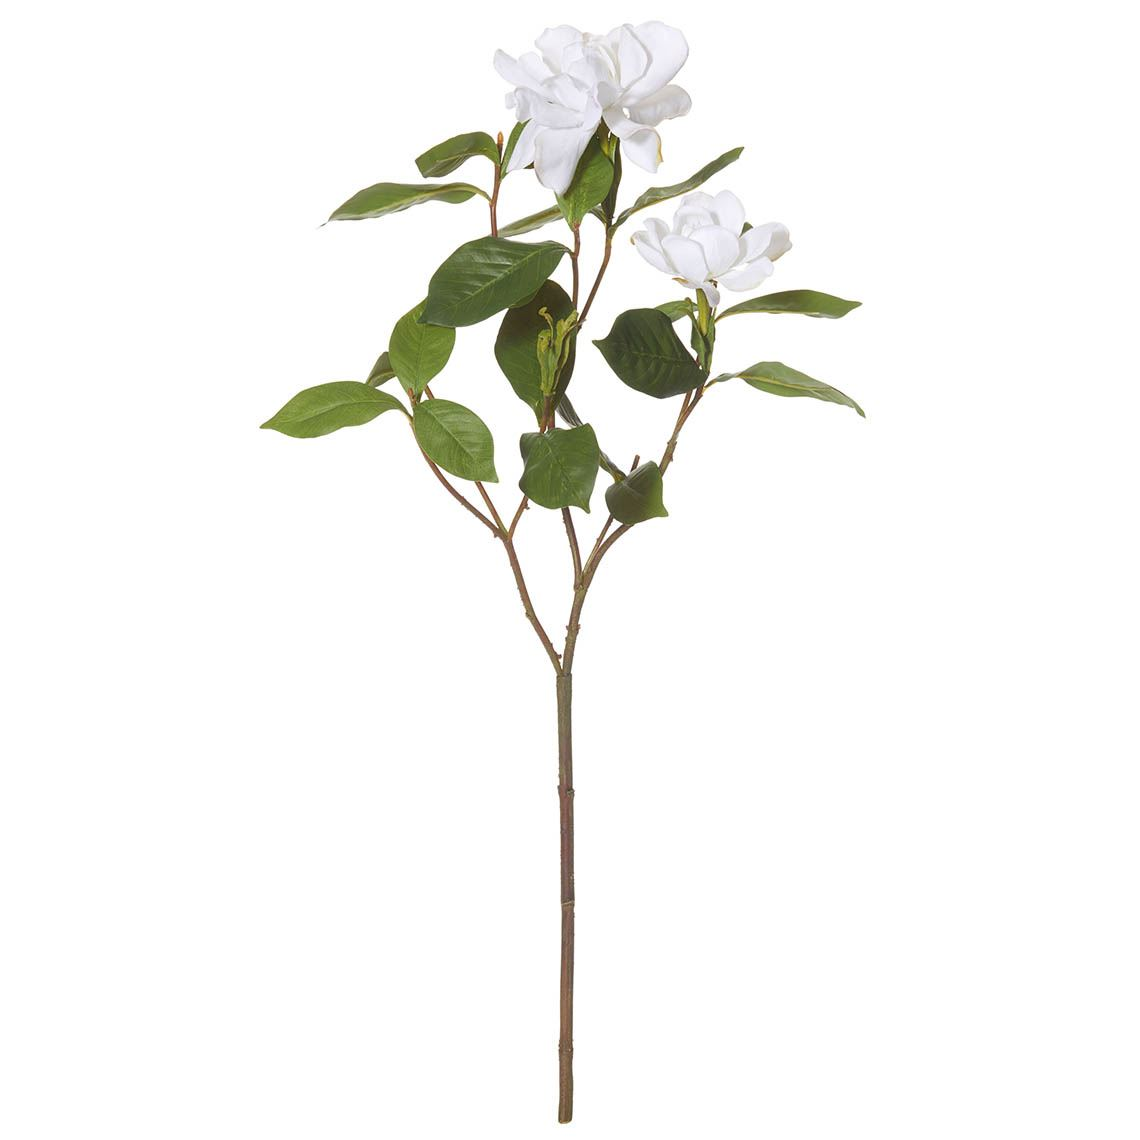 Gardenia Flower Spra Size W 28cm x D 20cm x H 56cm in White Plastic/Fabric/Wire Freedom by Freedom, a Plants for sale on Style Sourcebook